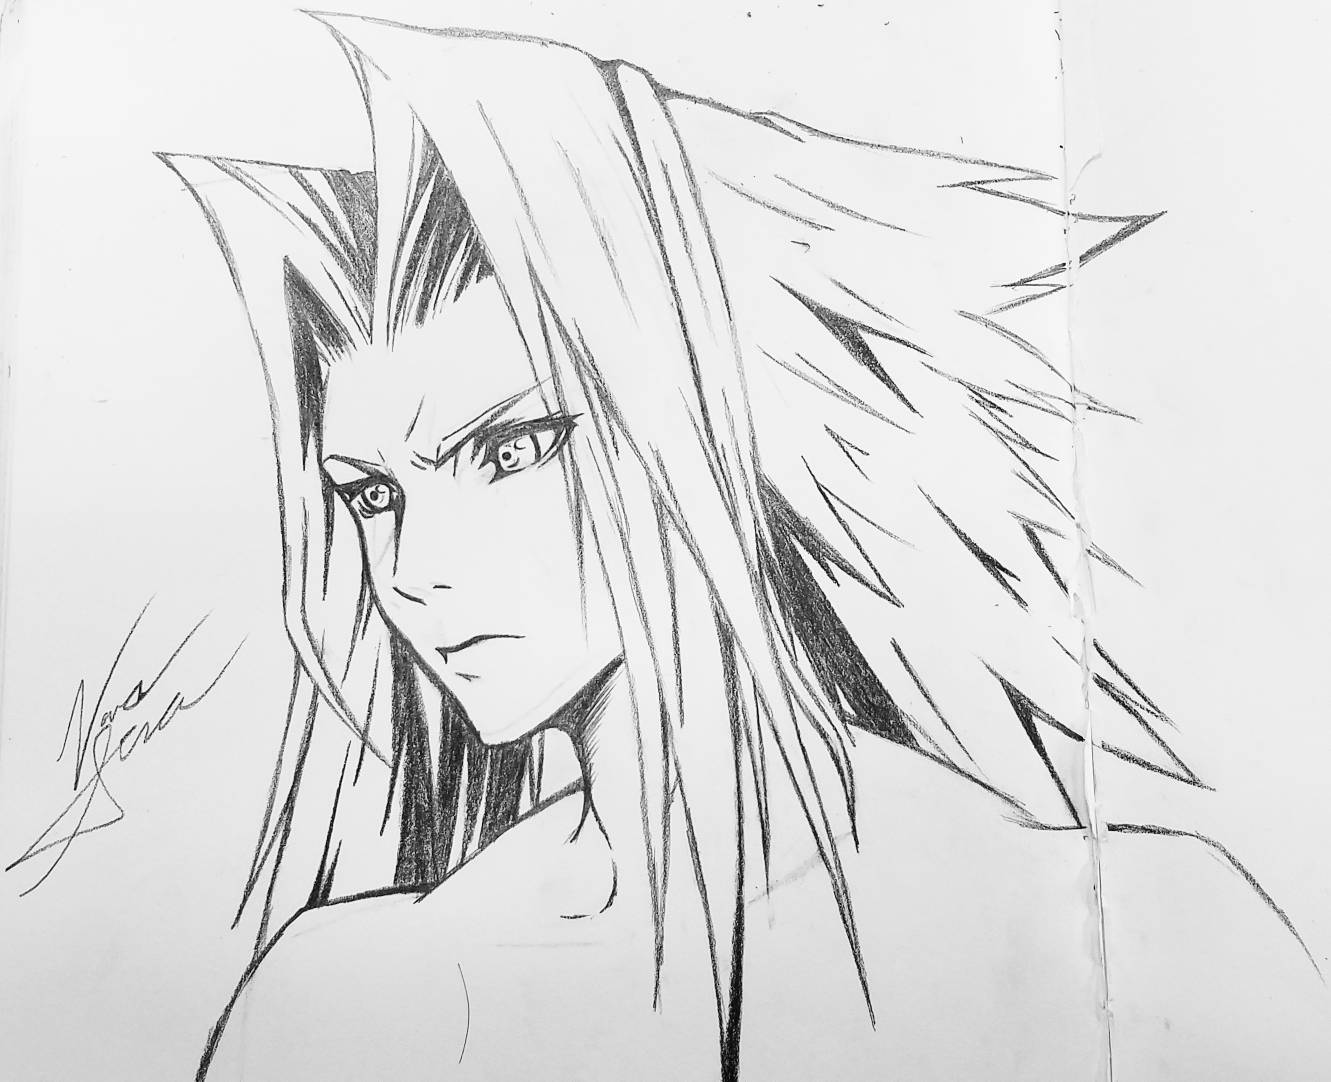 Nova Sera Final Fantasy Art Style By Ultimosda On Deviantart